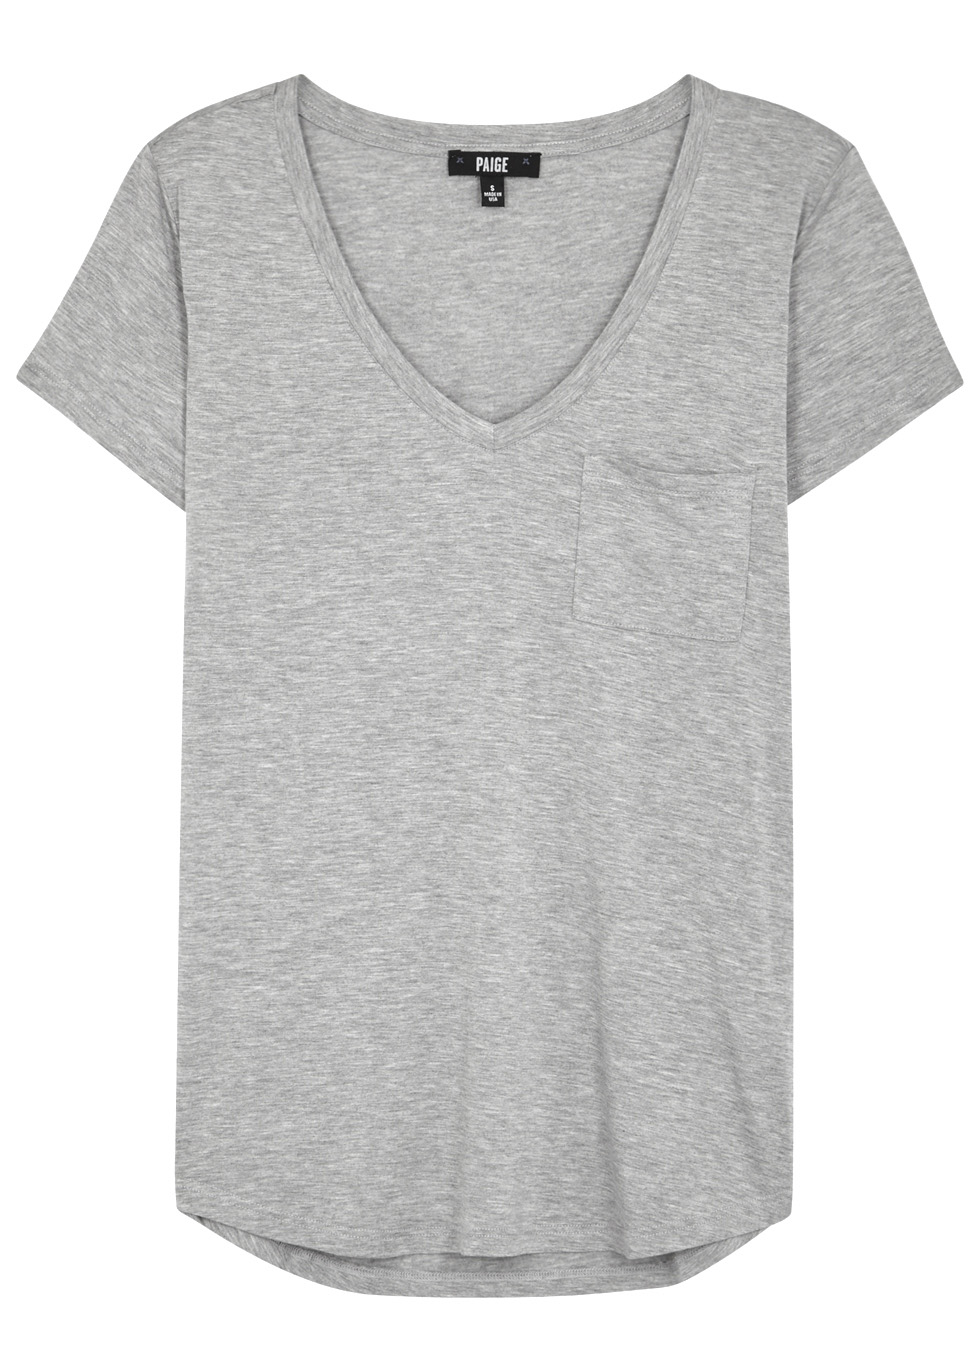 Lynnea jersey T-shirt - Paige